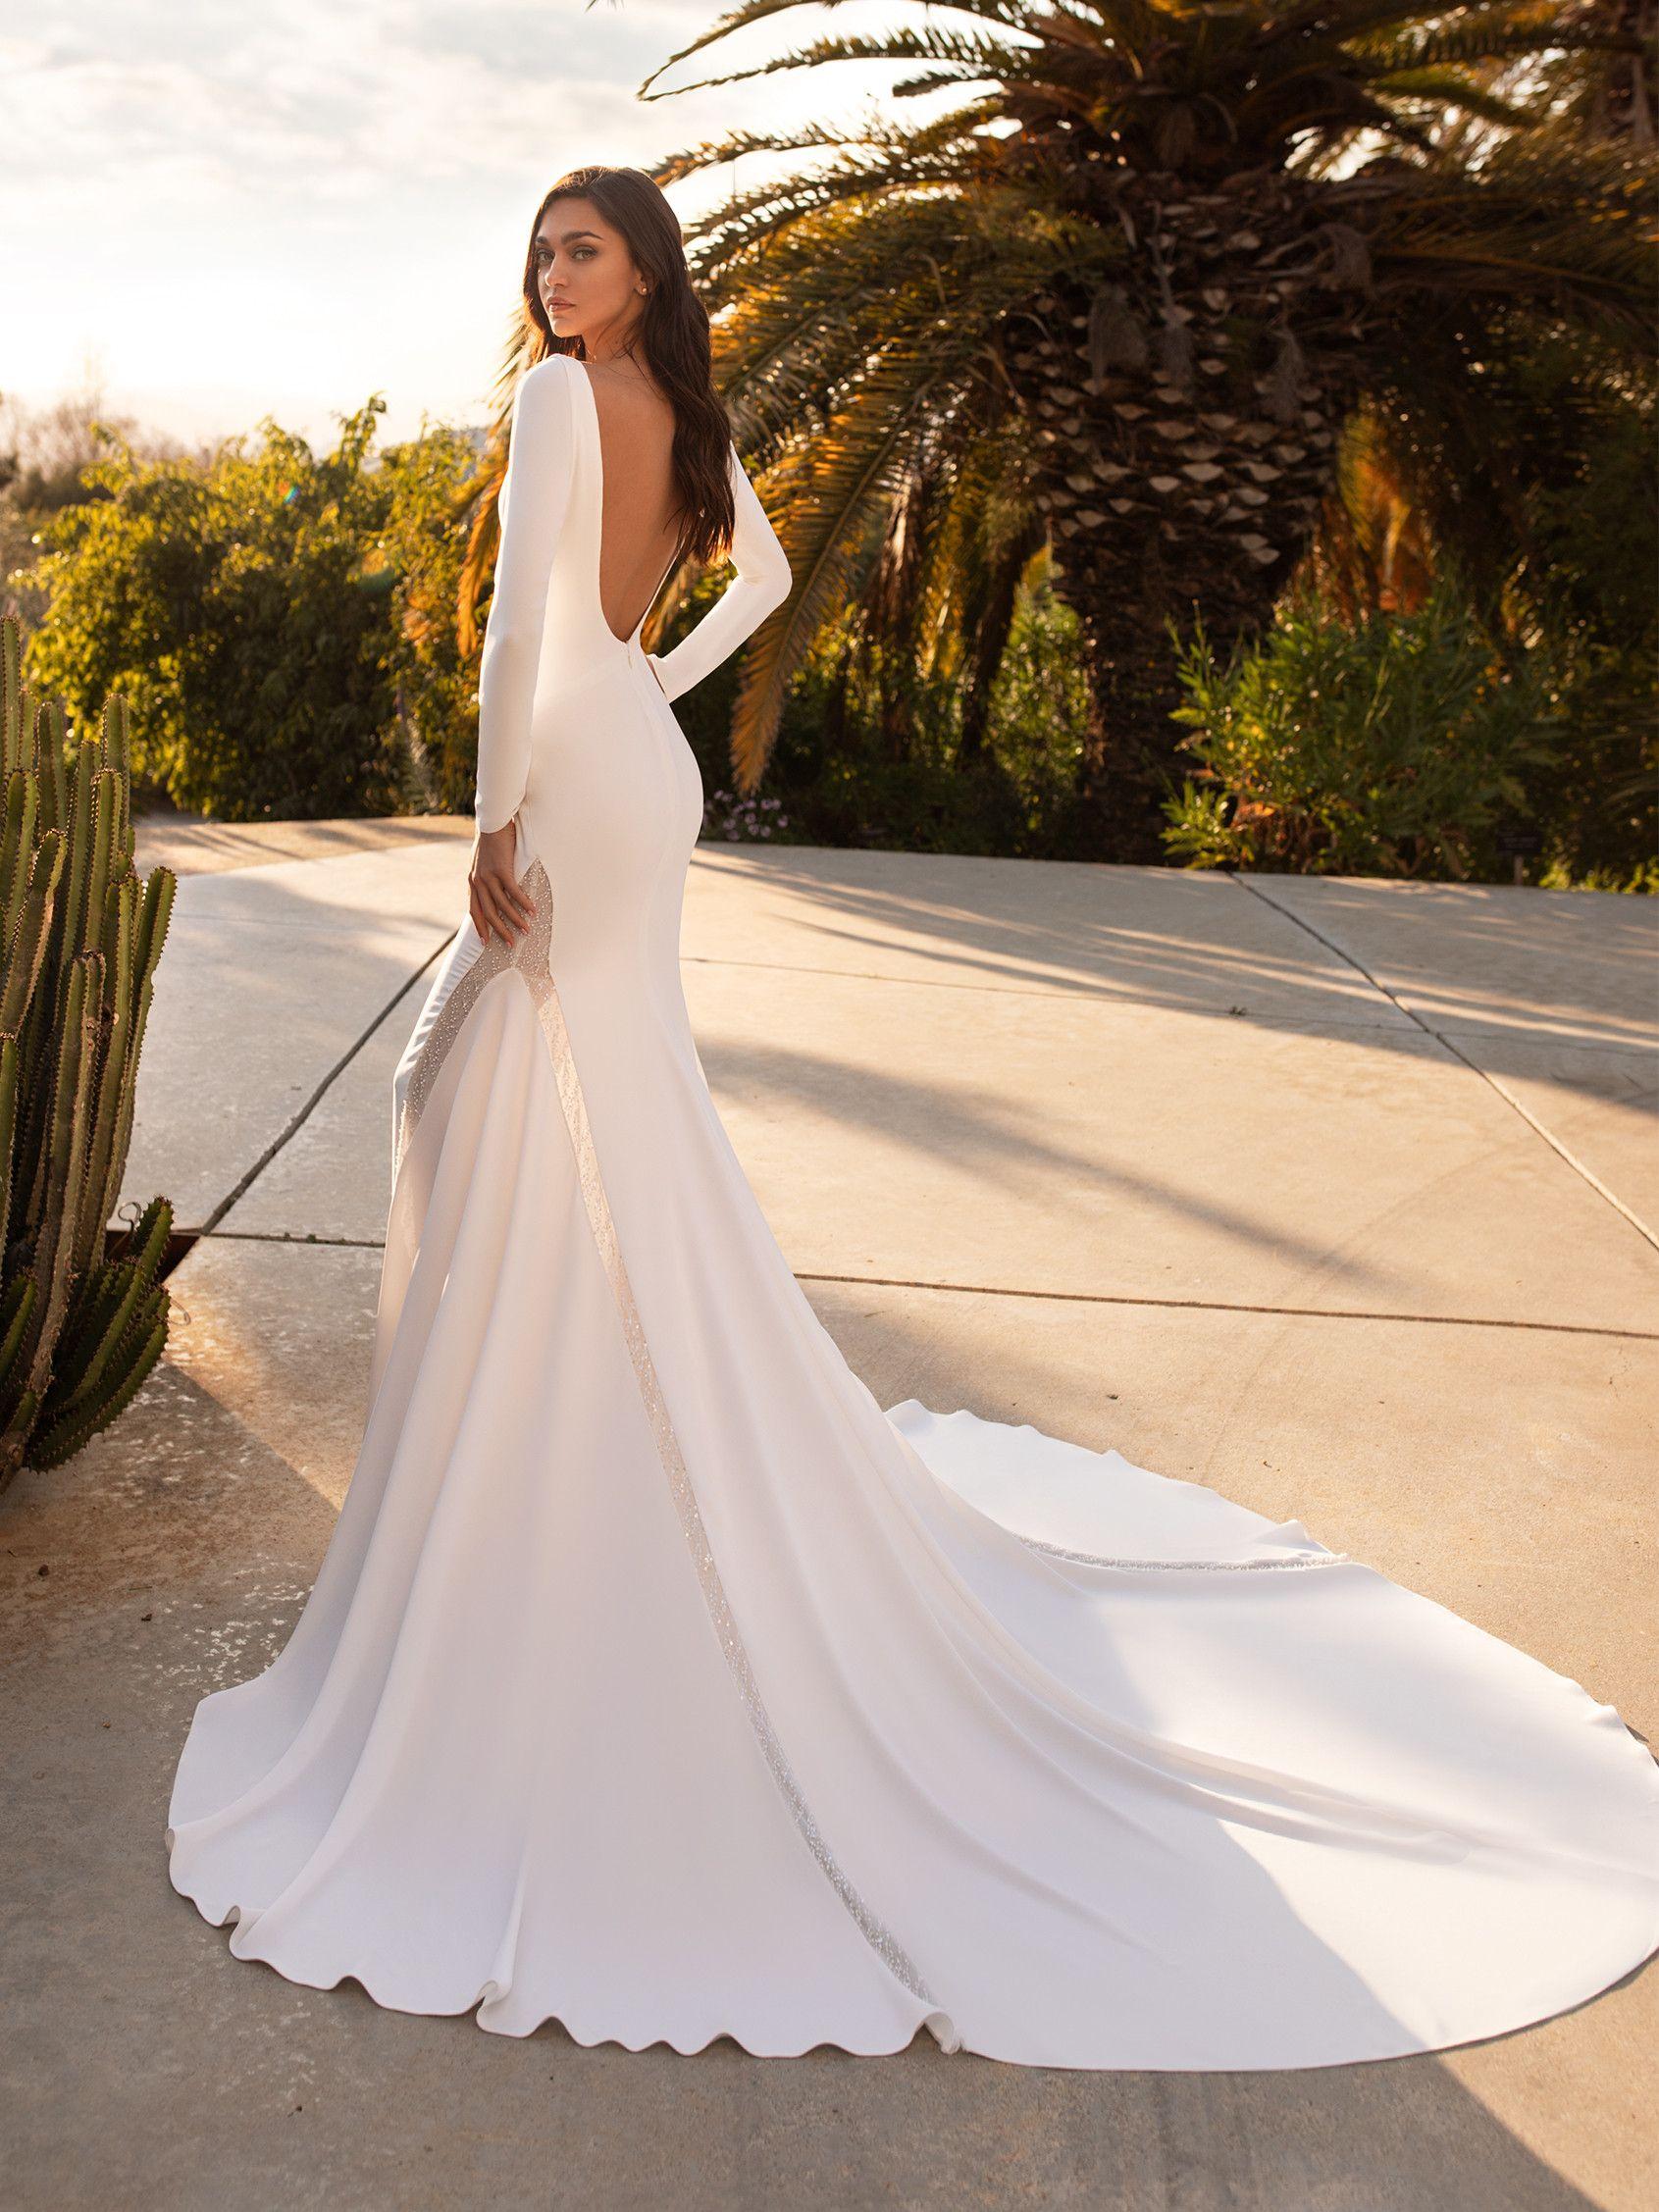 Bianca In 2020 Crepe Wedding Dress Wedding Dress Sleeves